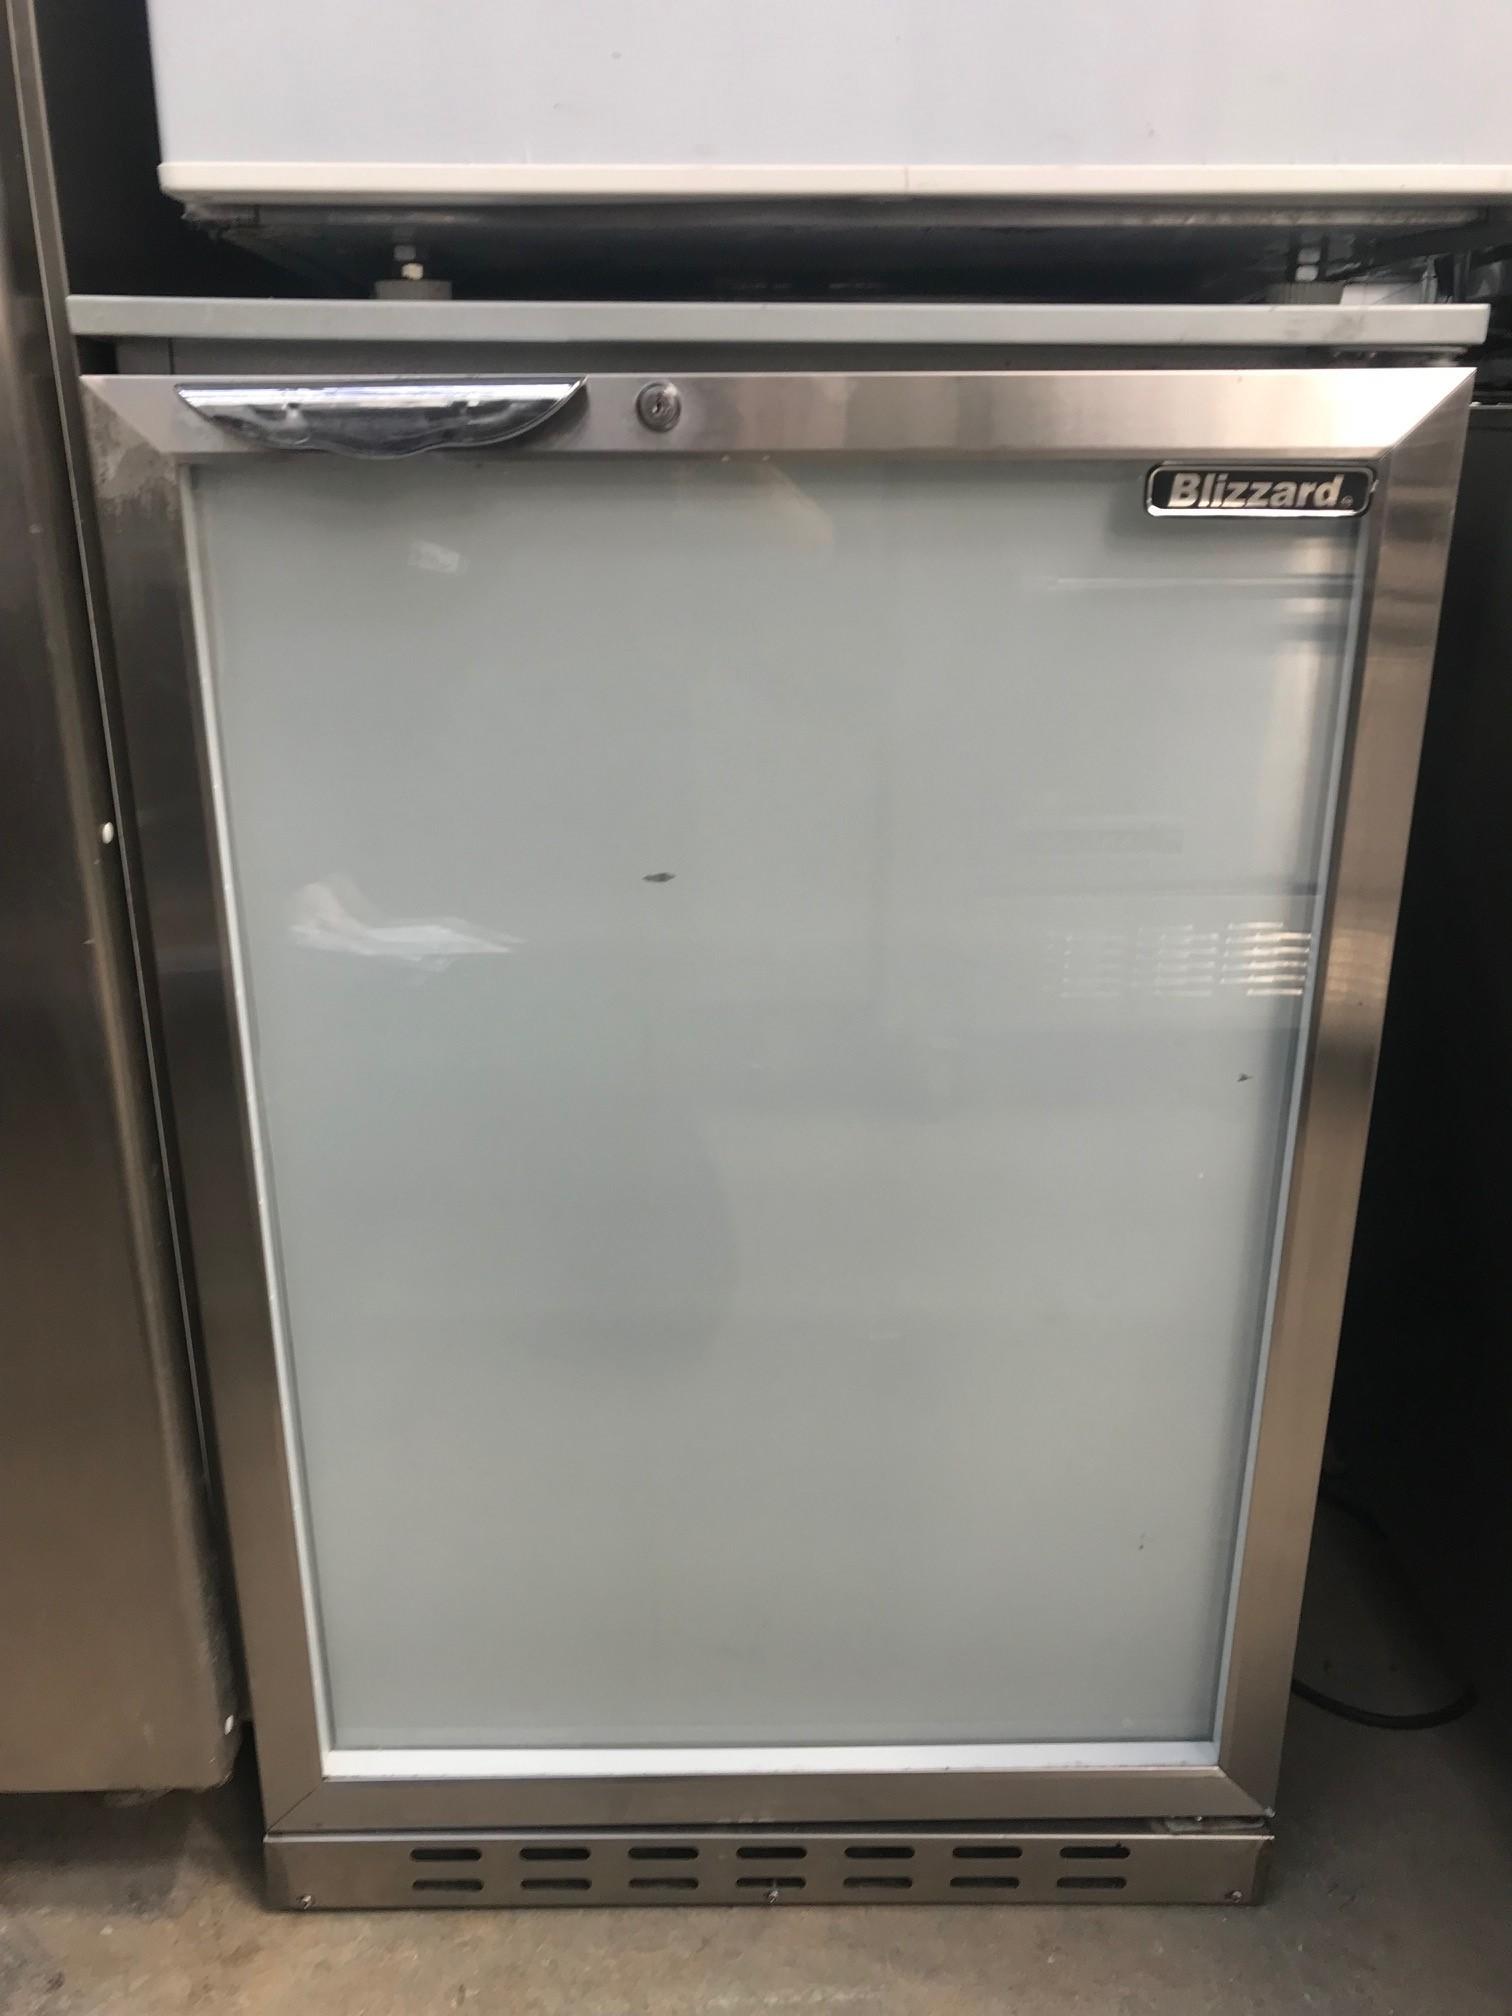 Lot 21 - Blizzard Bz-bar1ss Single door Back bar counter Back Bar Chiller Glass doors that can hold 130